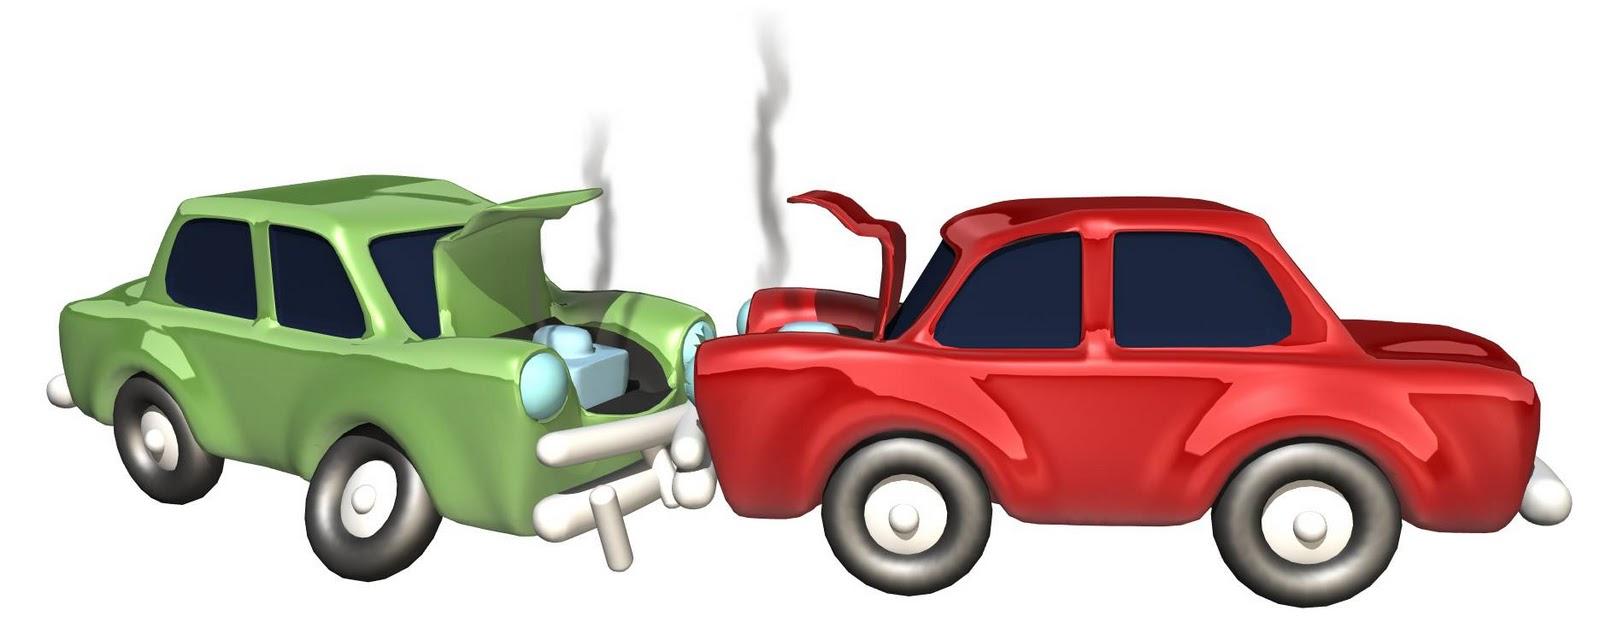 Car Crashing Icon